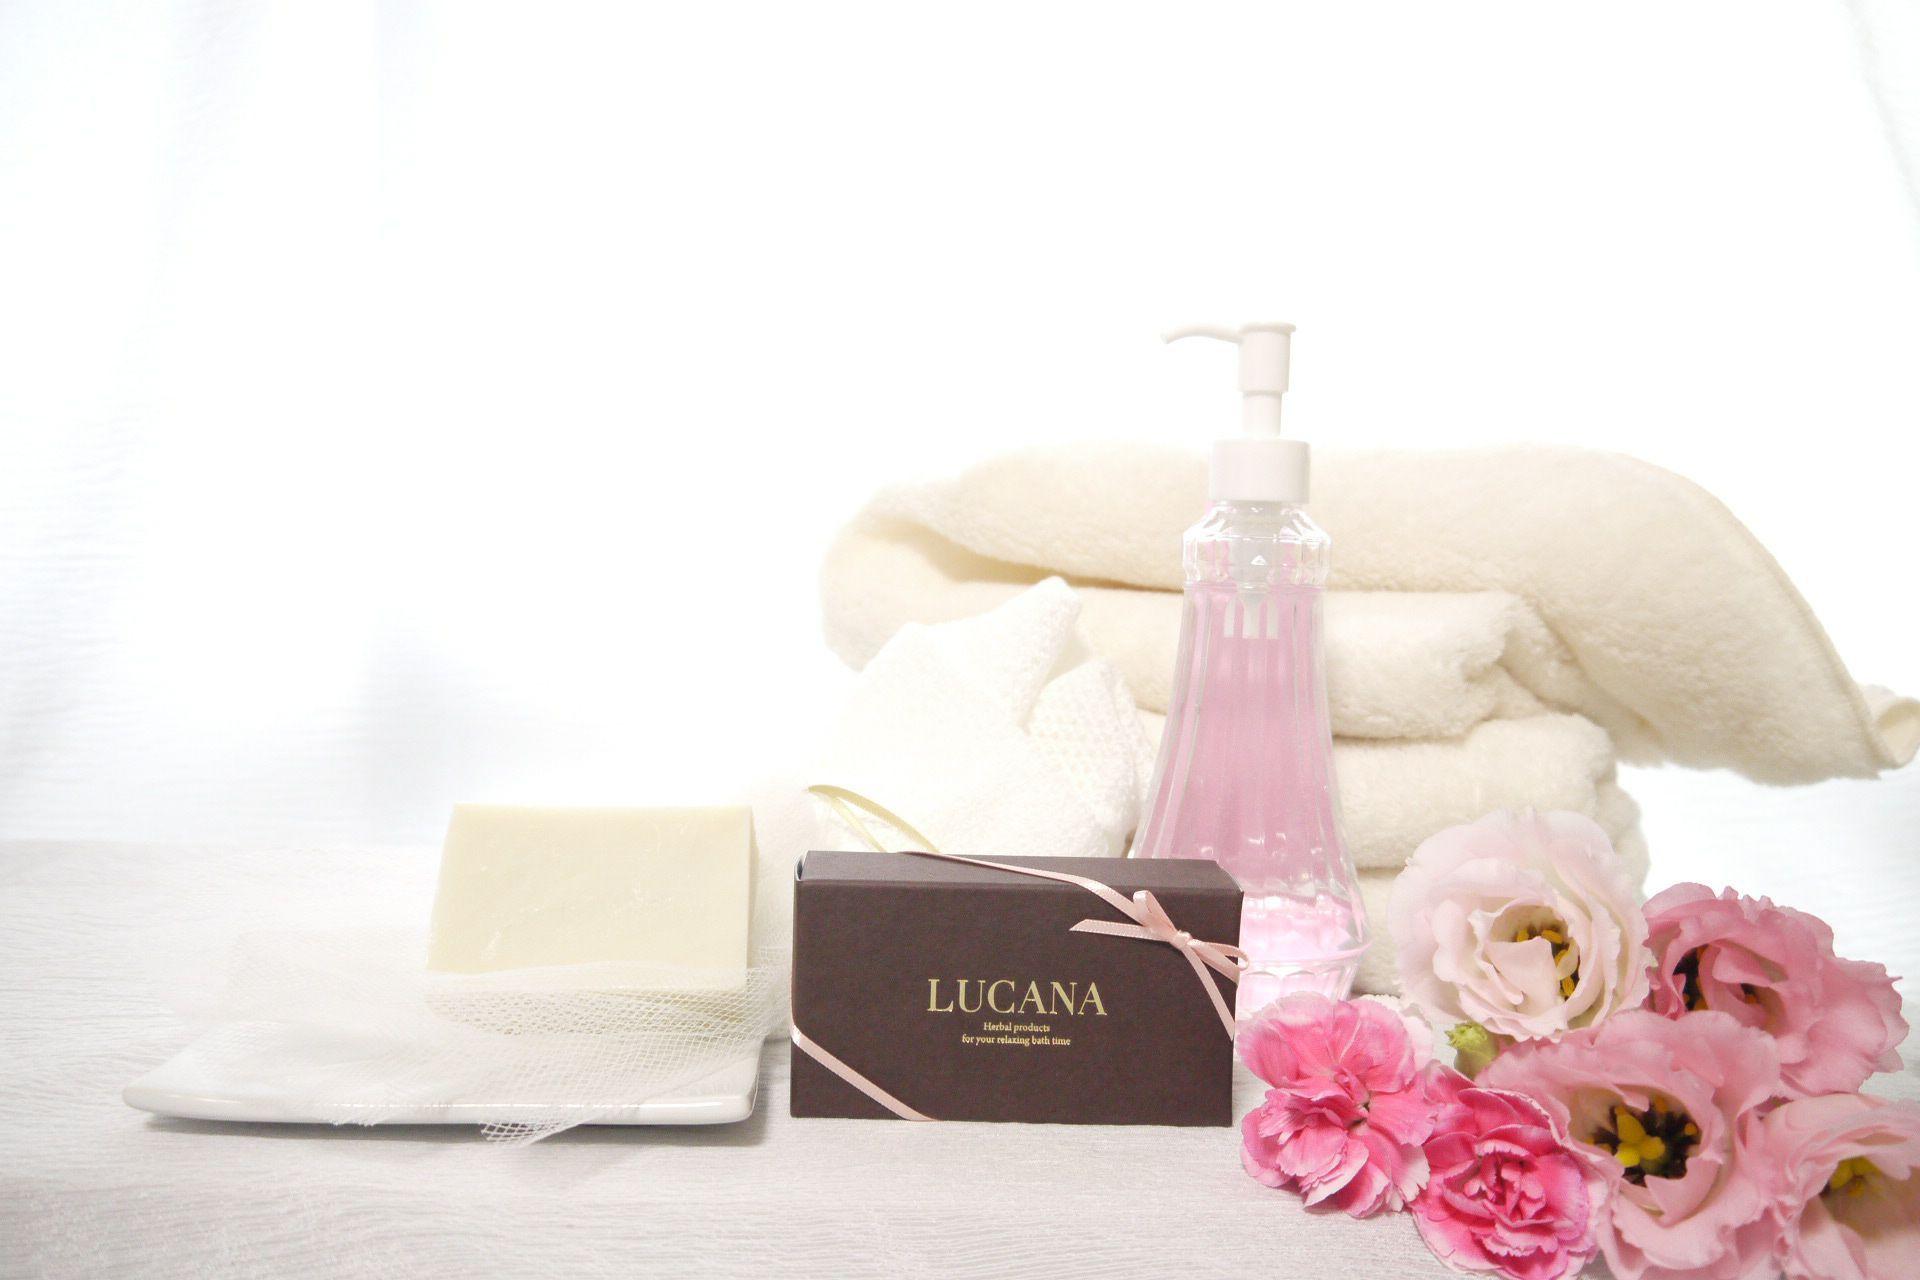 Geranium & Clary sage Soap(ゼラニウム クラリセージ ソープ)